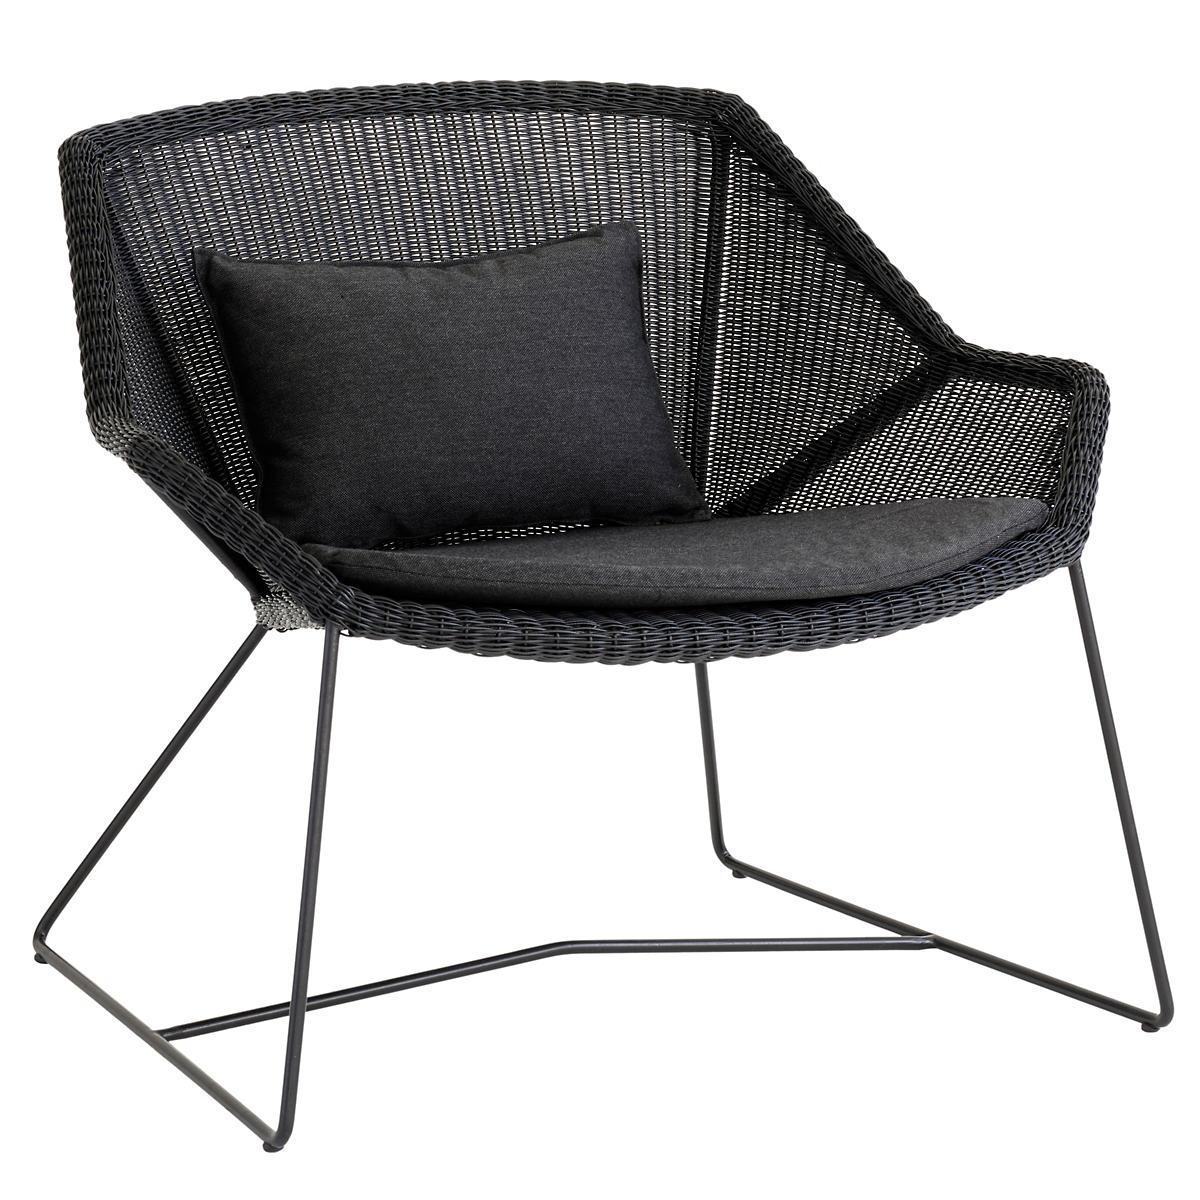 Black Breeze Lounge Chair